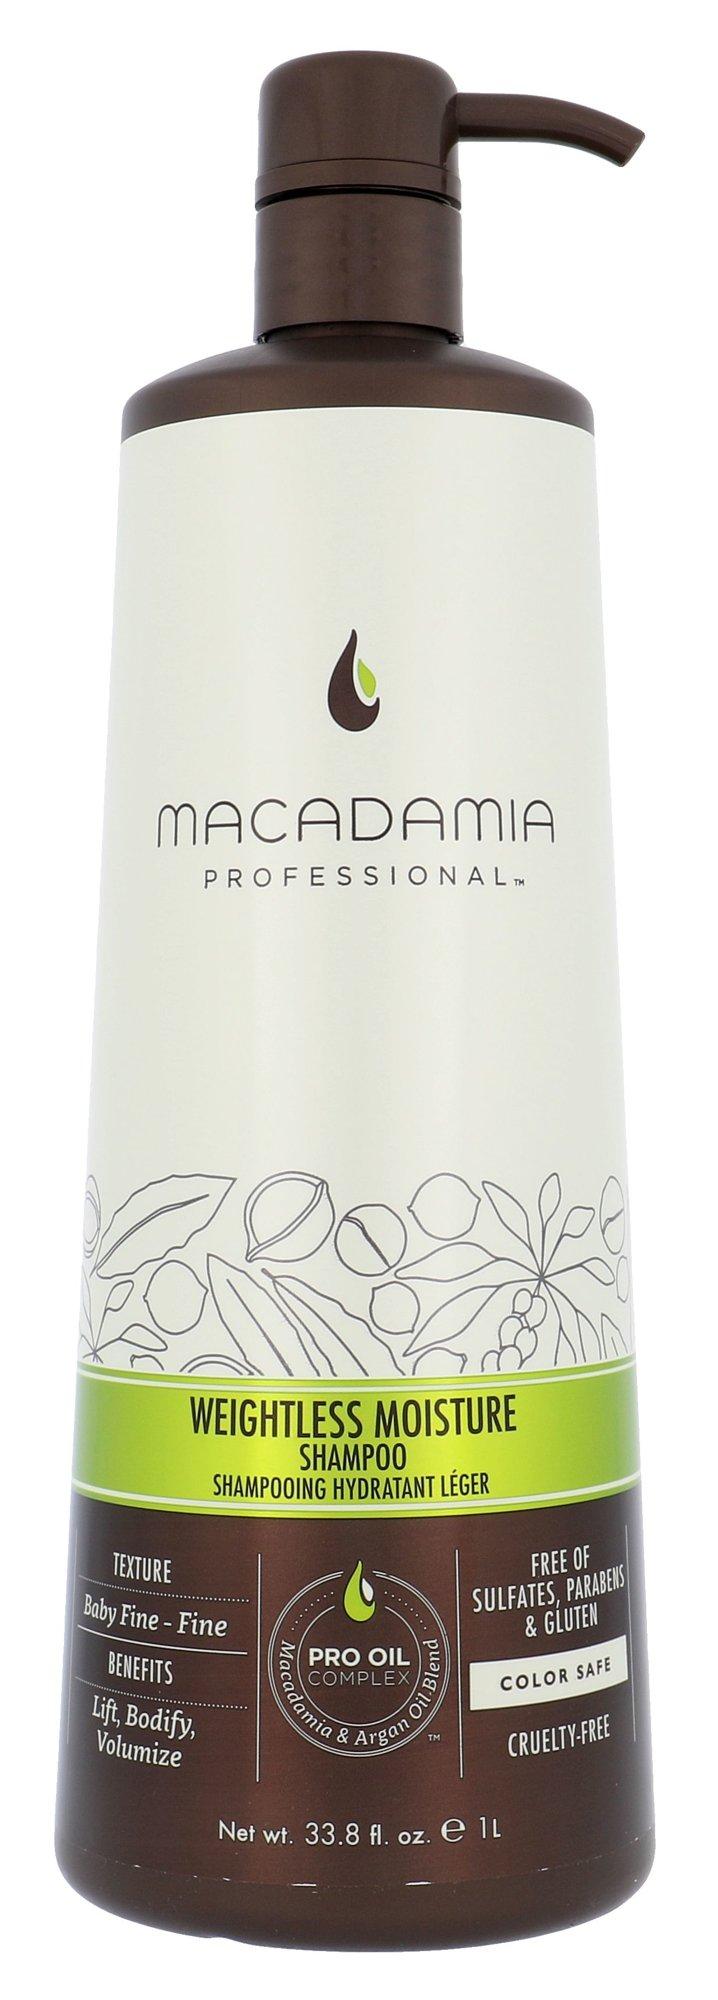 Macadamia Professional Weightless Moisture Cosmetic 1000ml